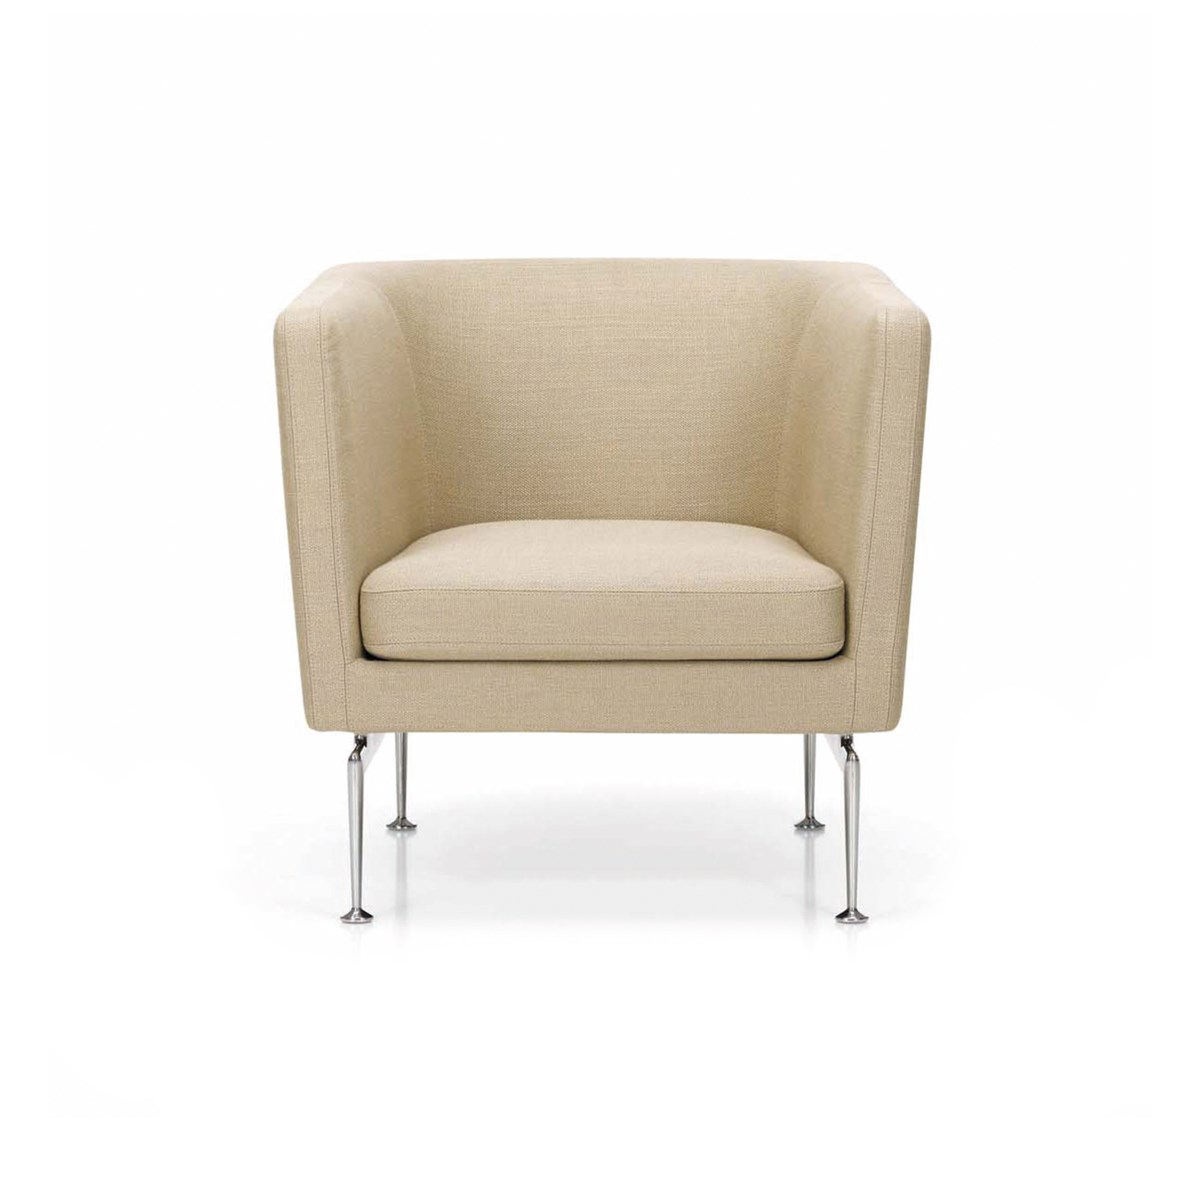 Vitra-Antonio-Citterio-Suita-Armchair-Lounge-Chairs-Matisse-1